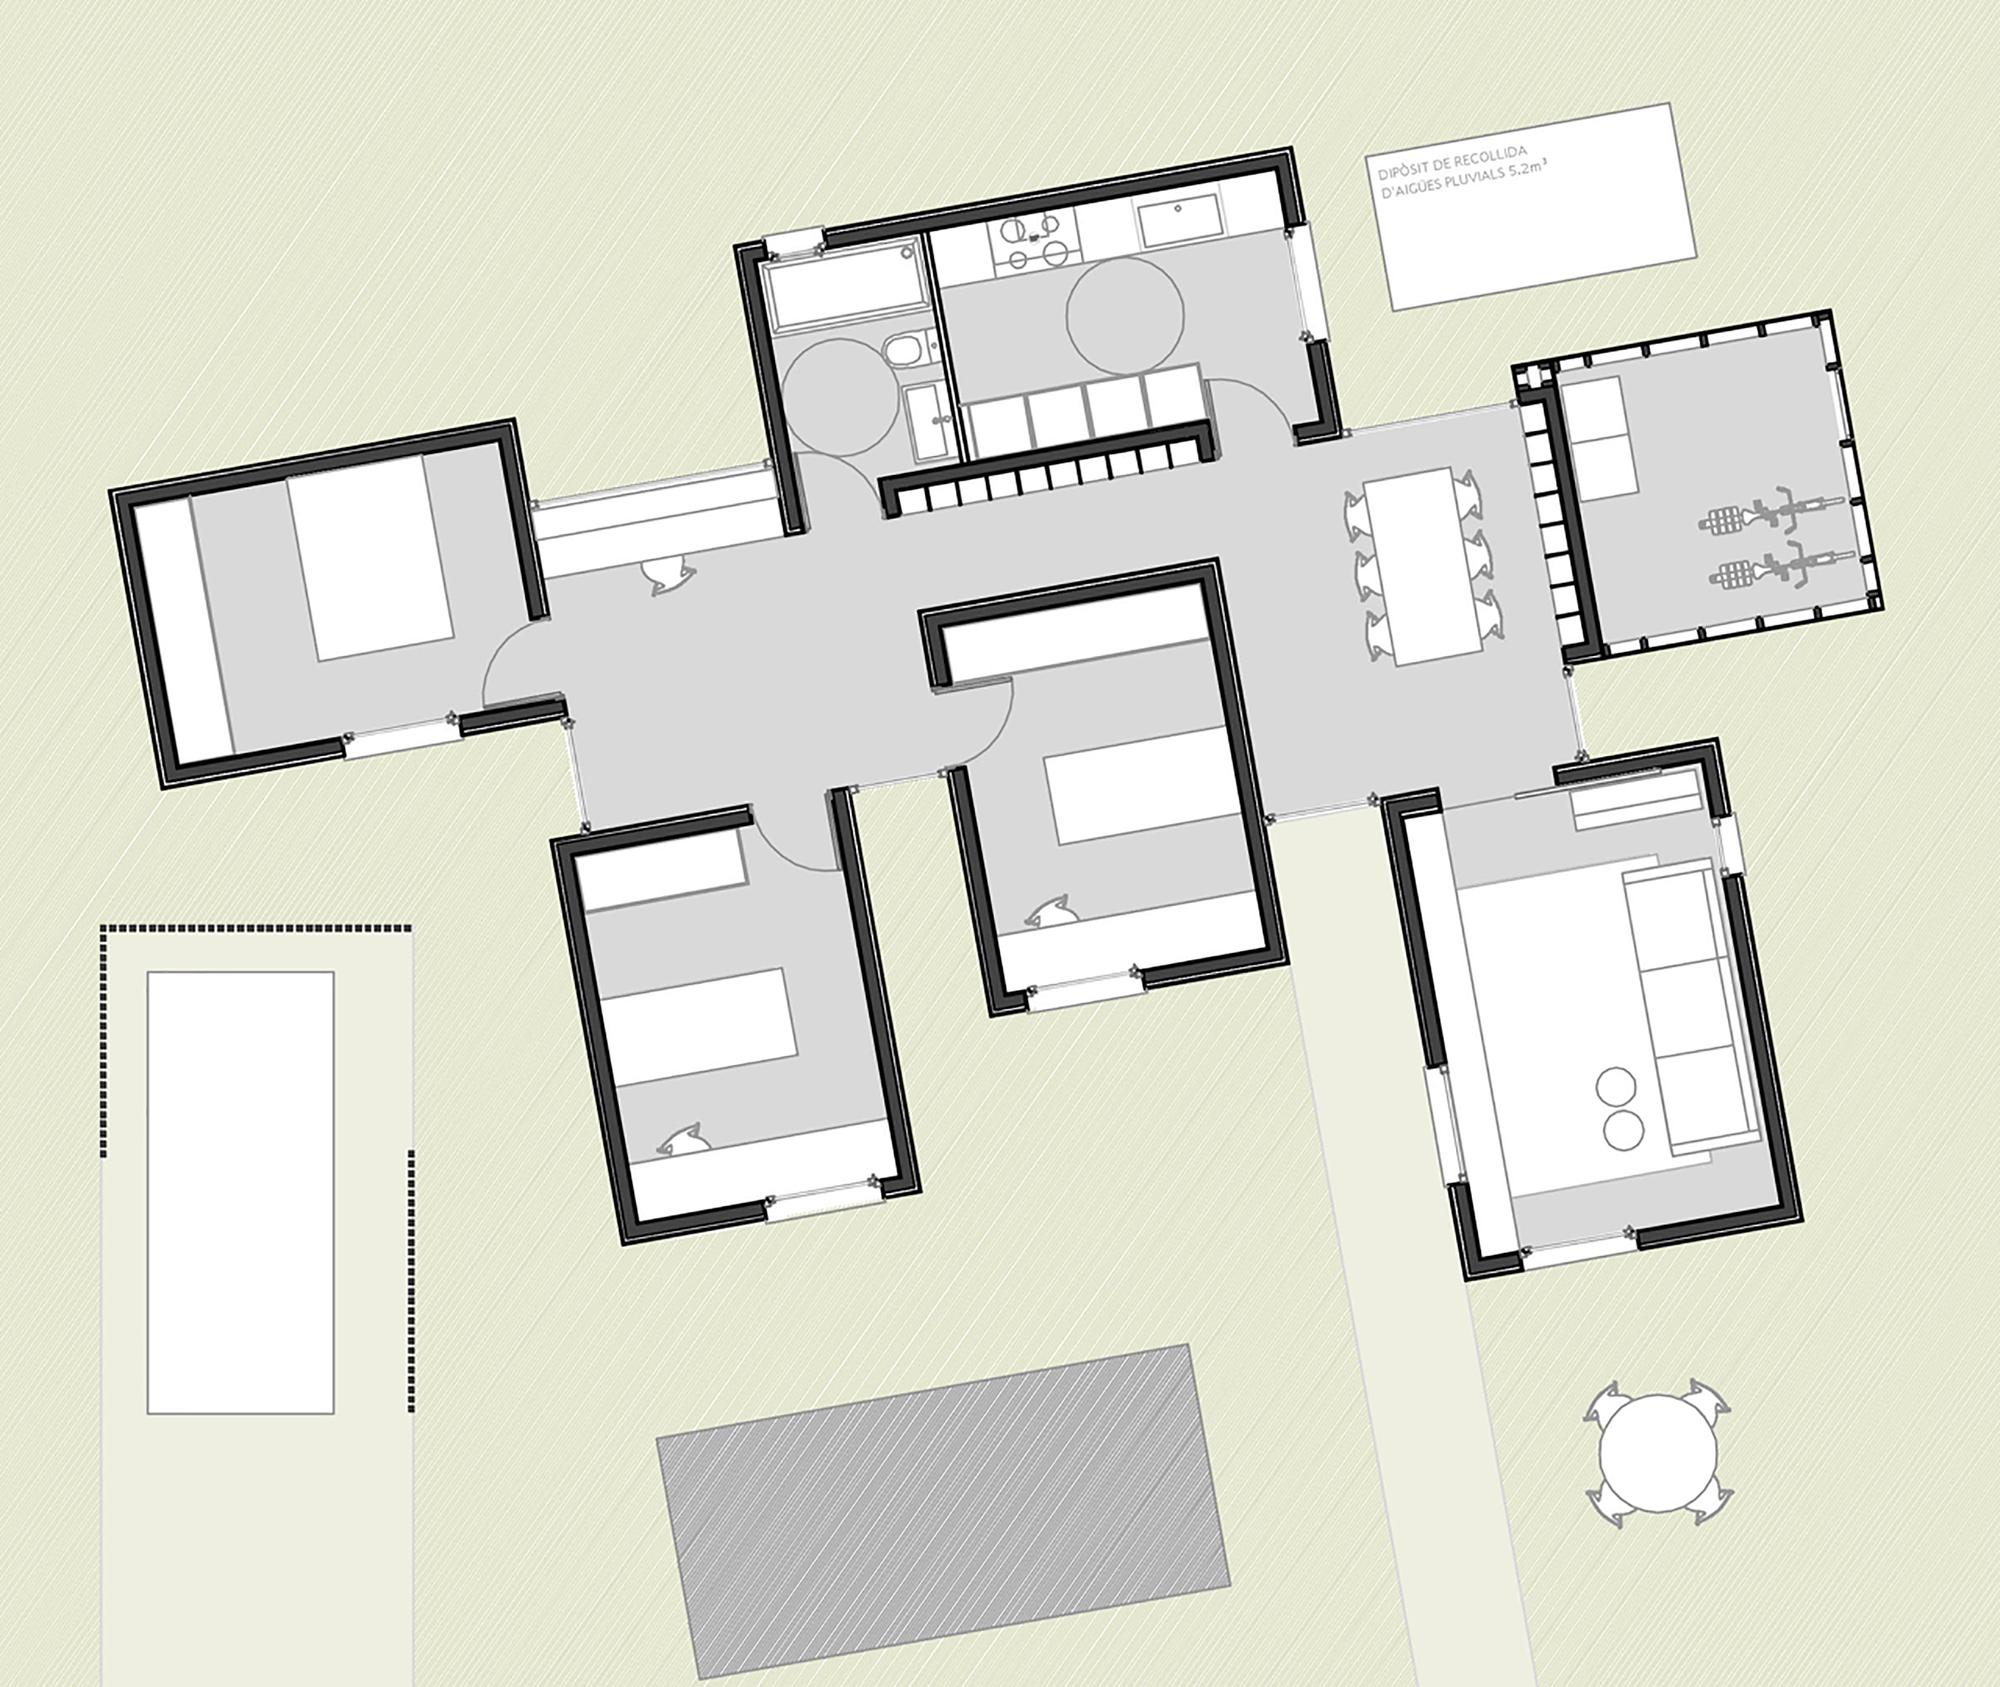 GG casa bio-climatica - GG casa bio-climatica - schite